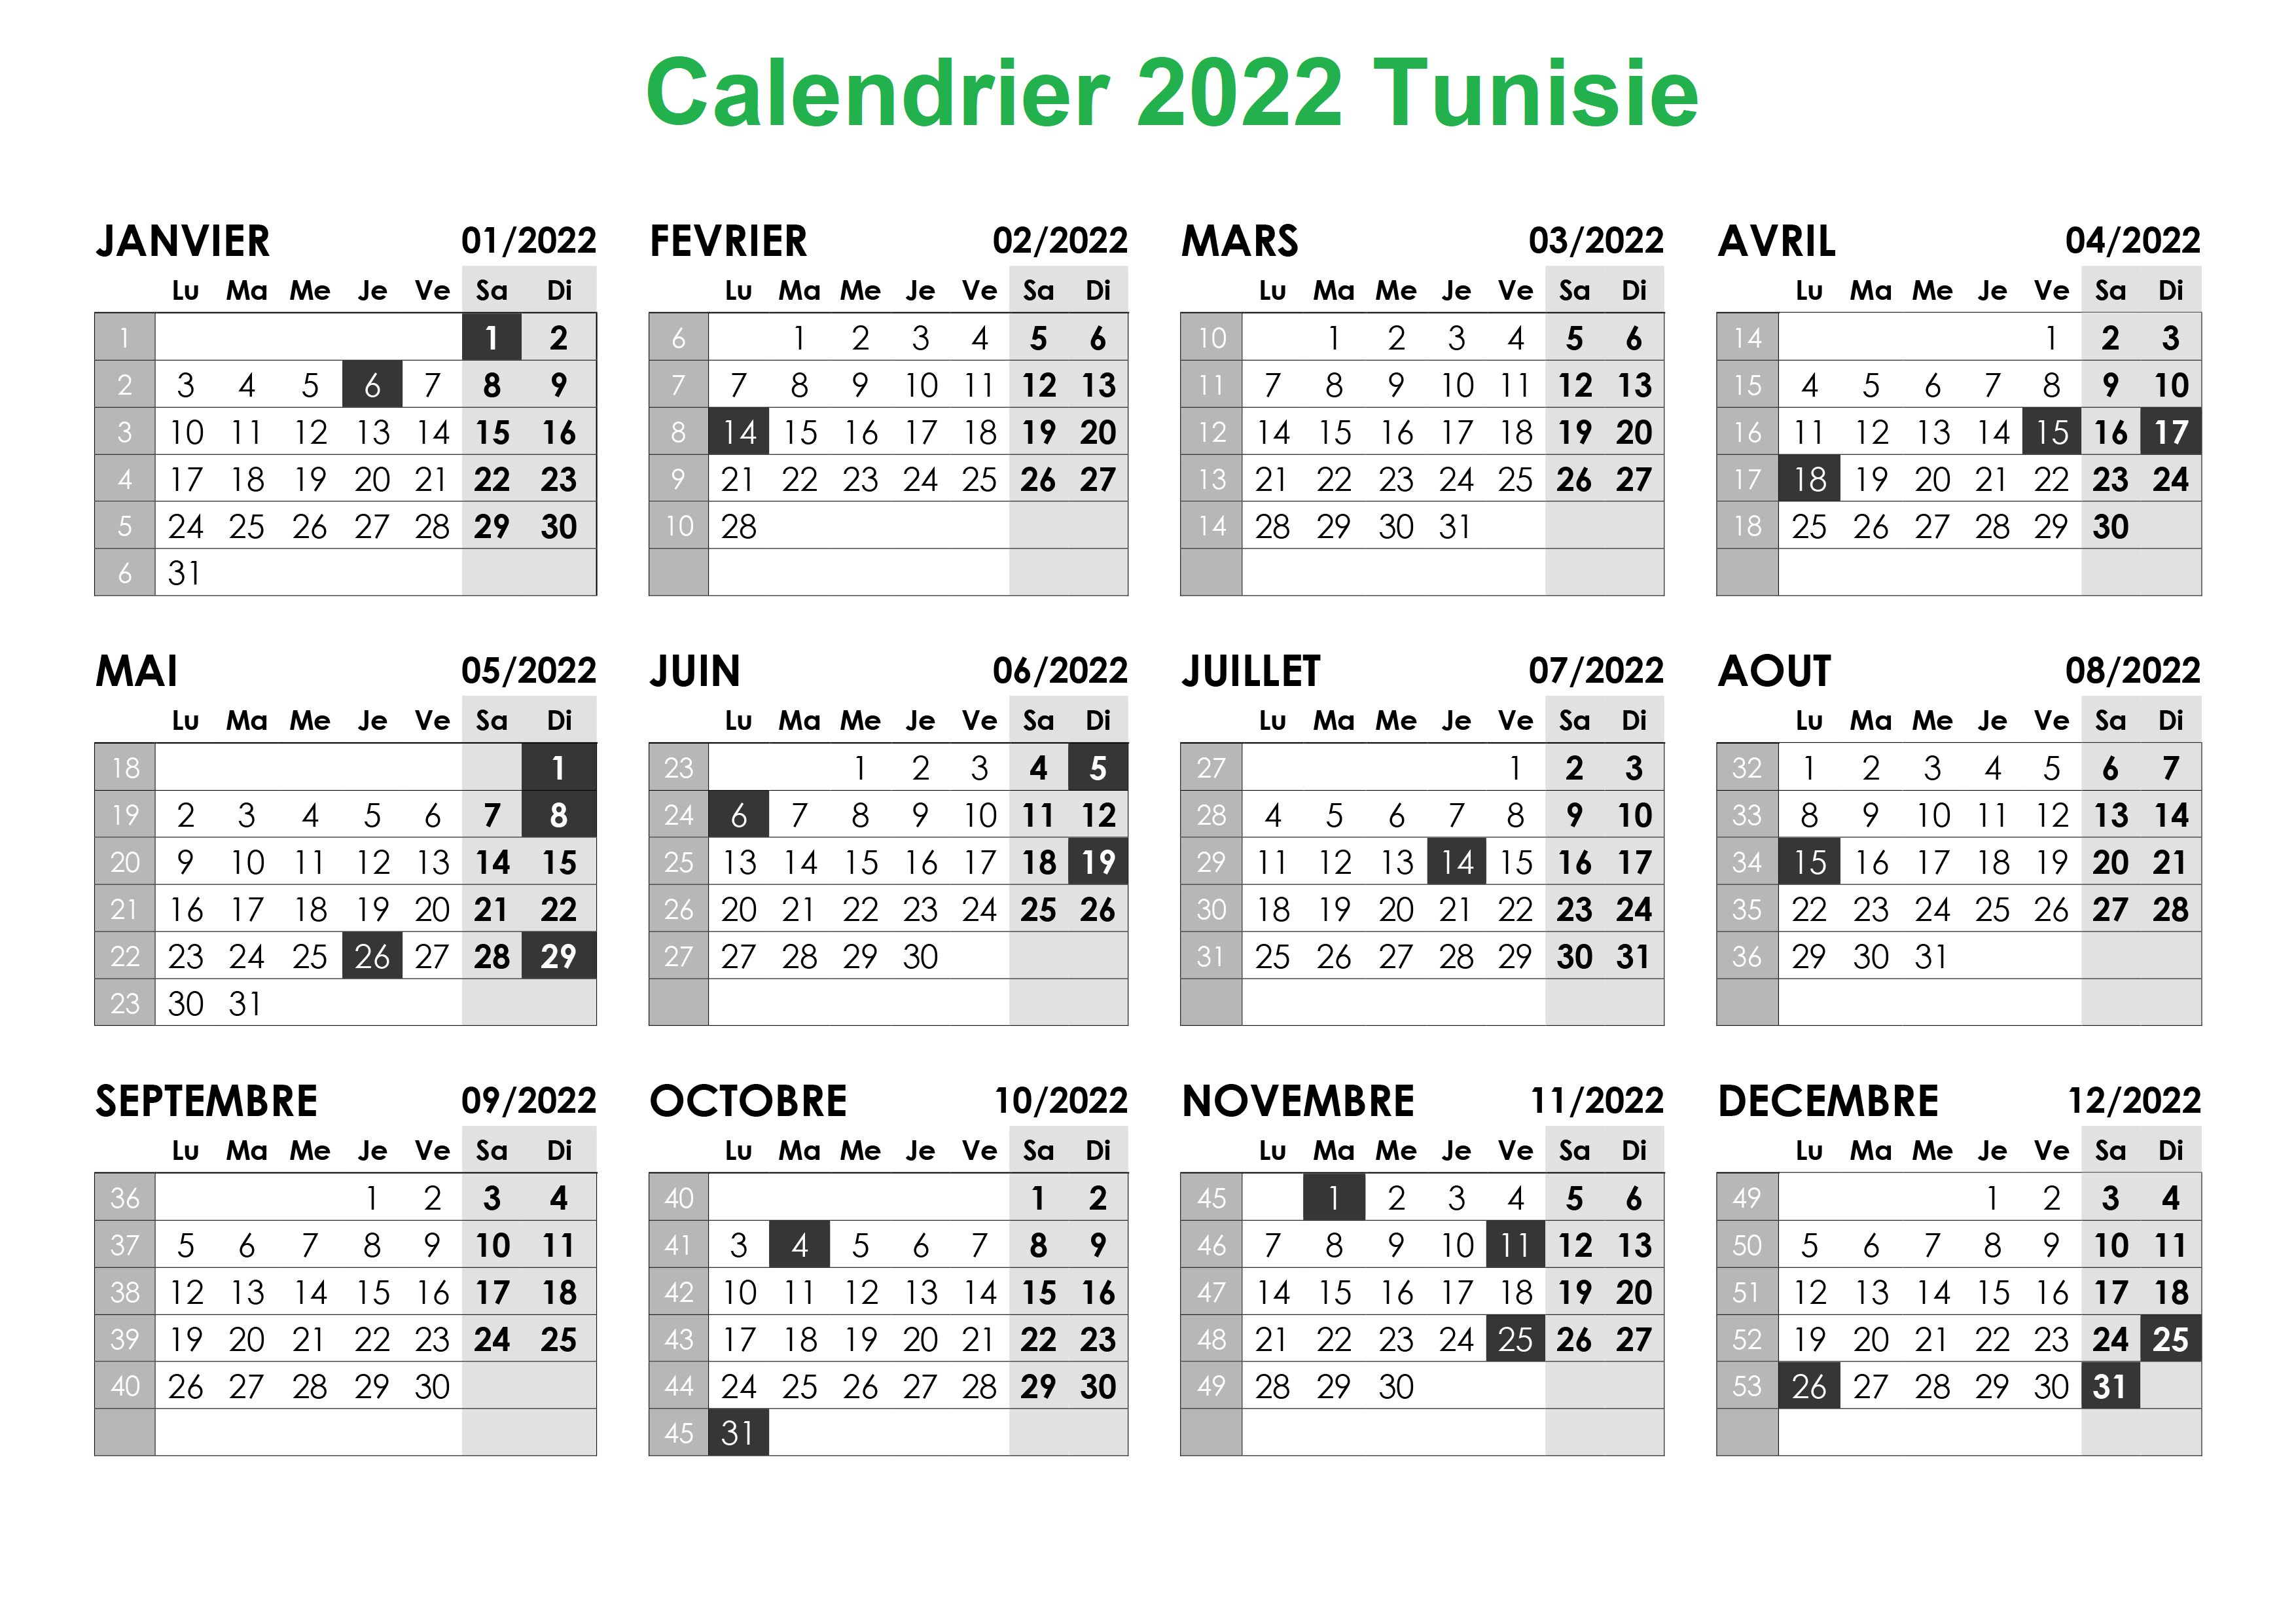 Calendrier Tunisie 2022